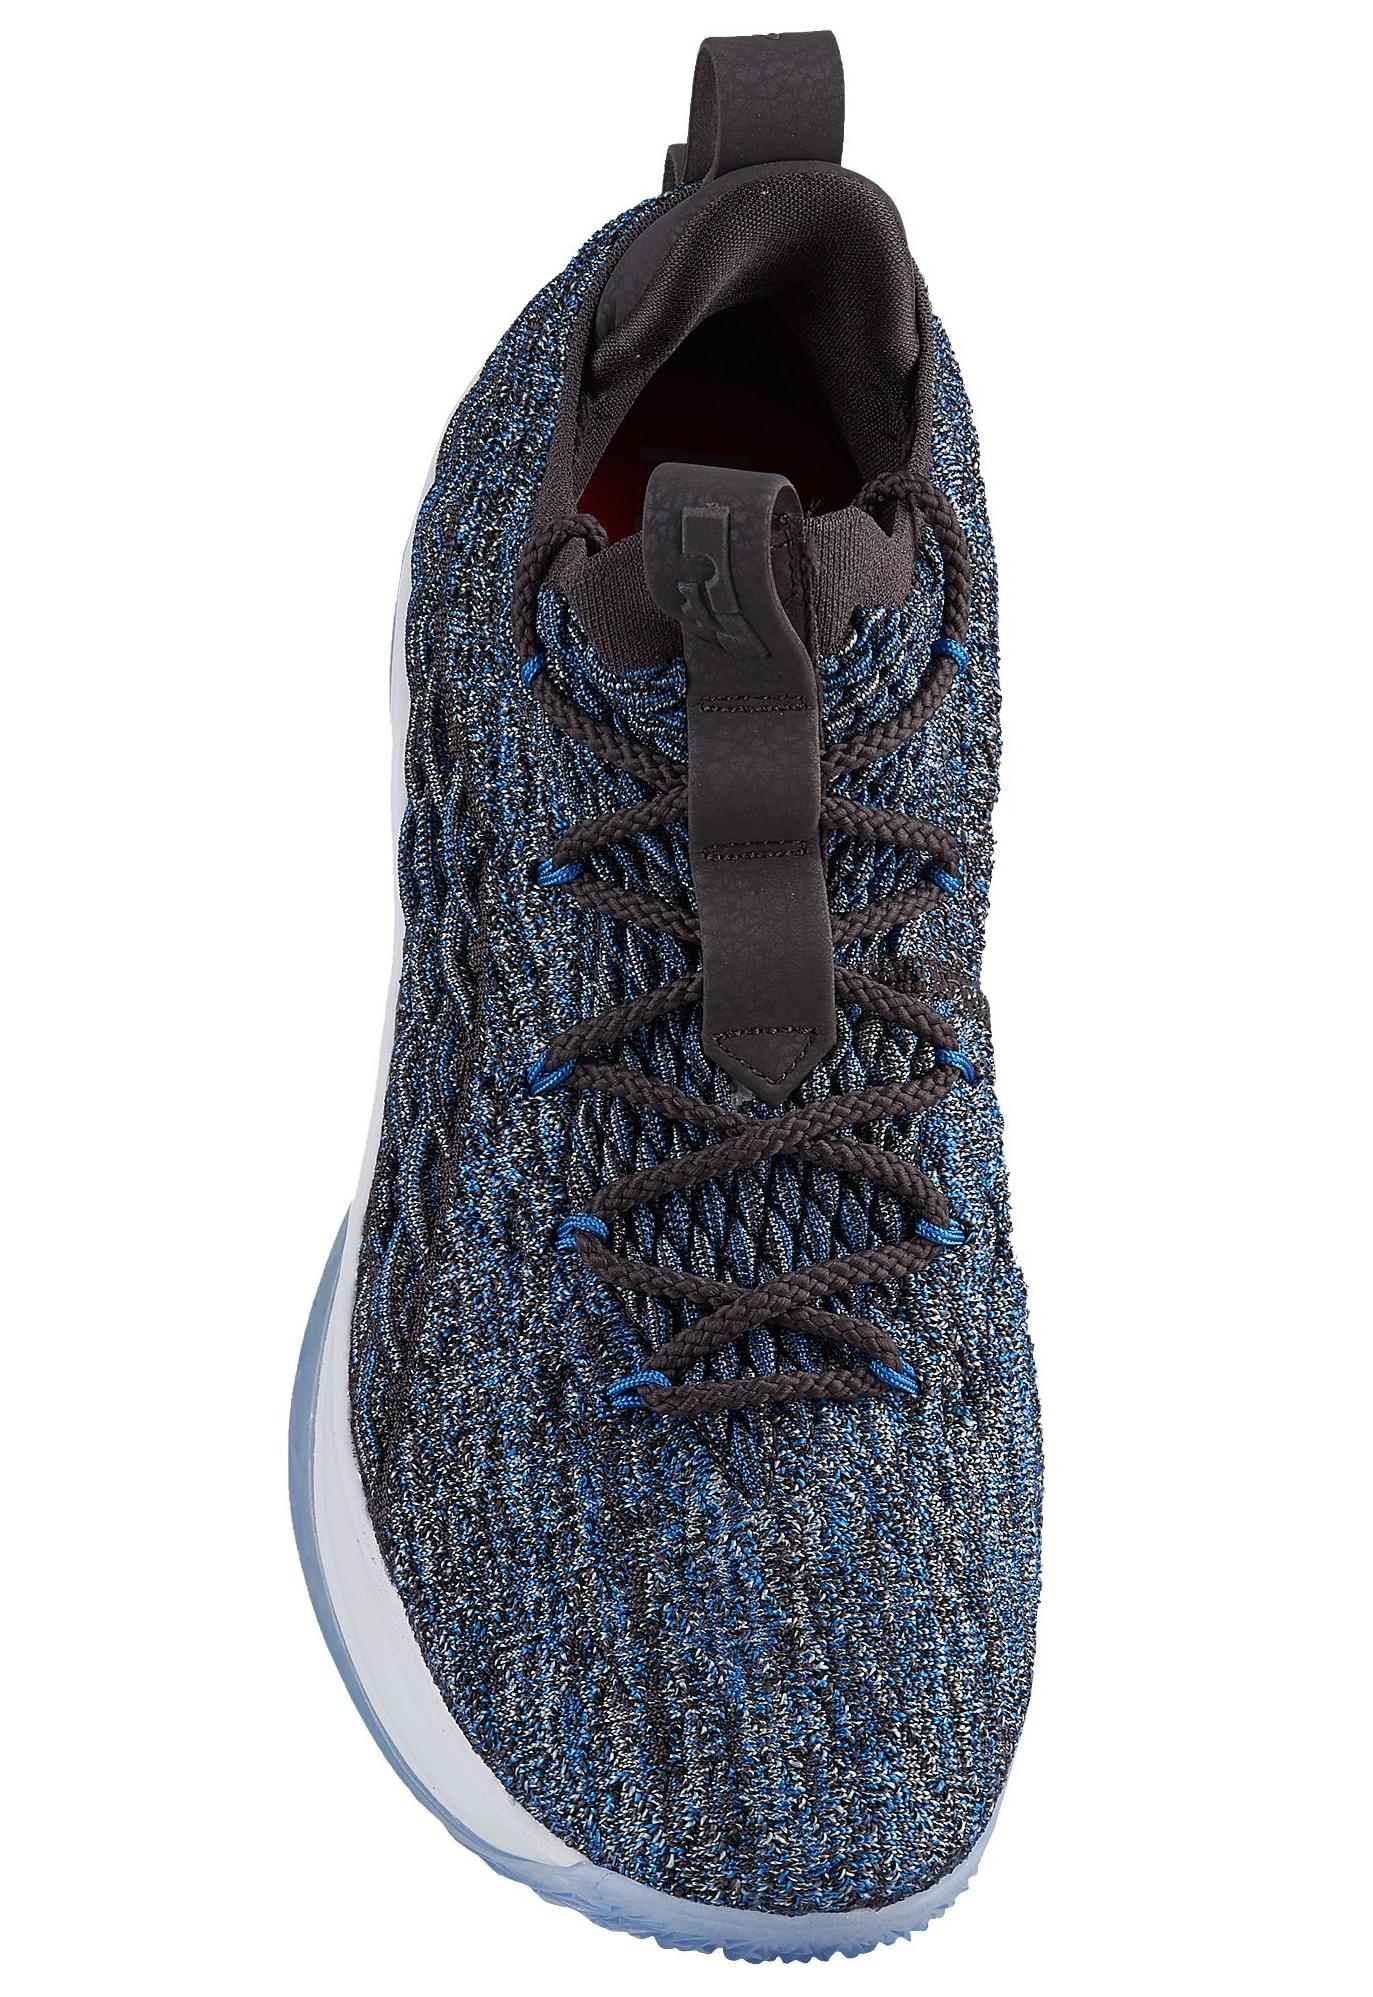 Nike LeBron 15 Low 'Signal Blue'